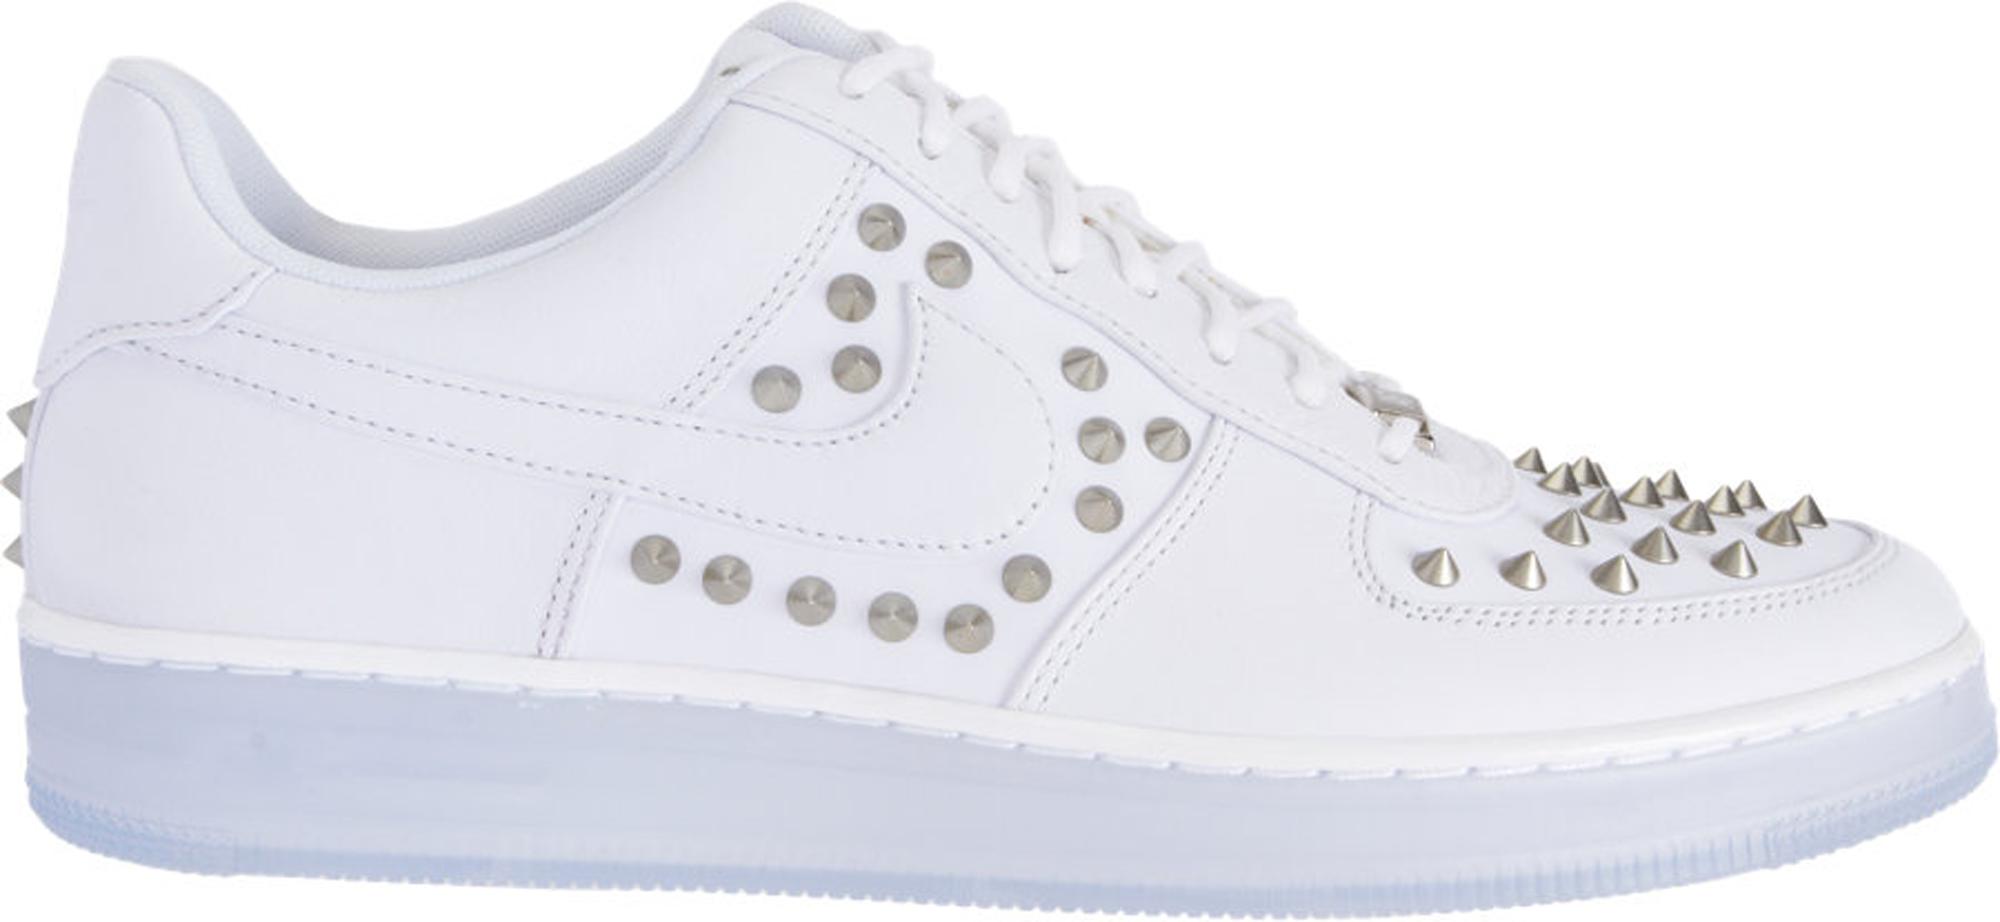 Nike Air Force 1 Downtown Spike White